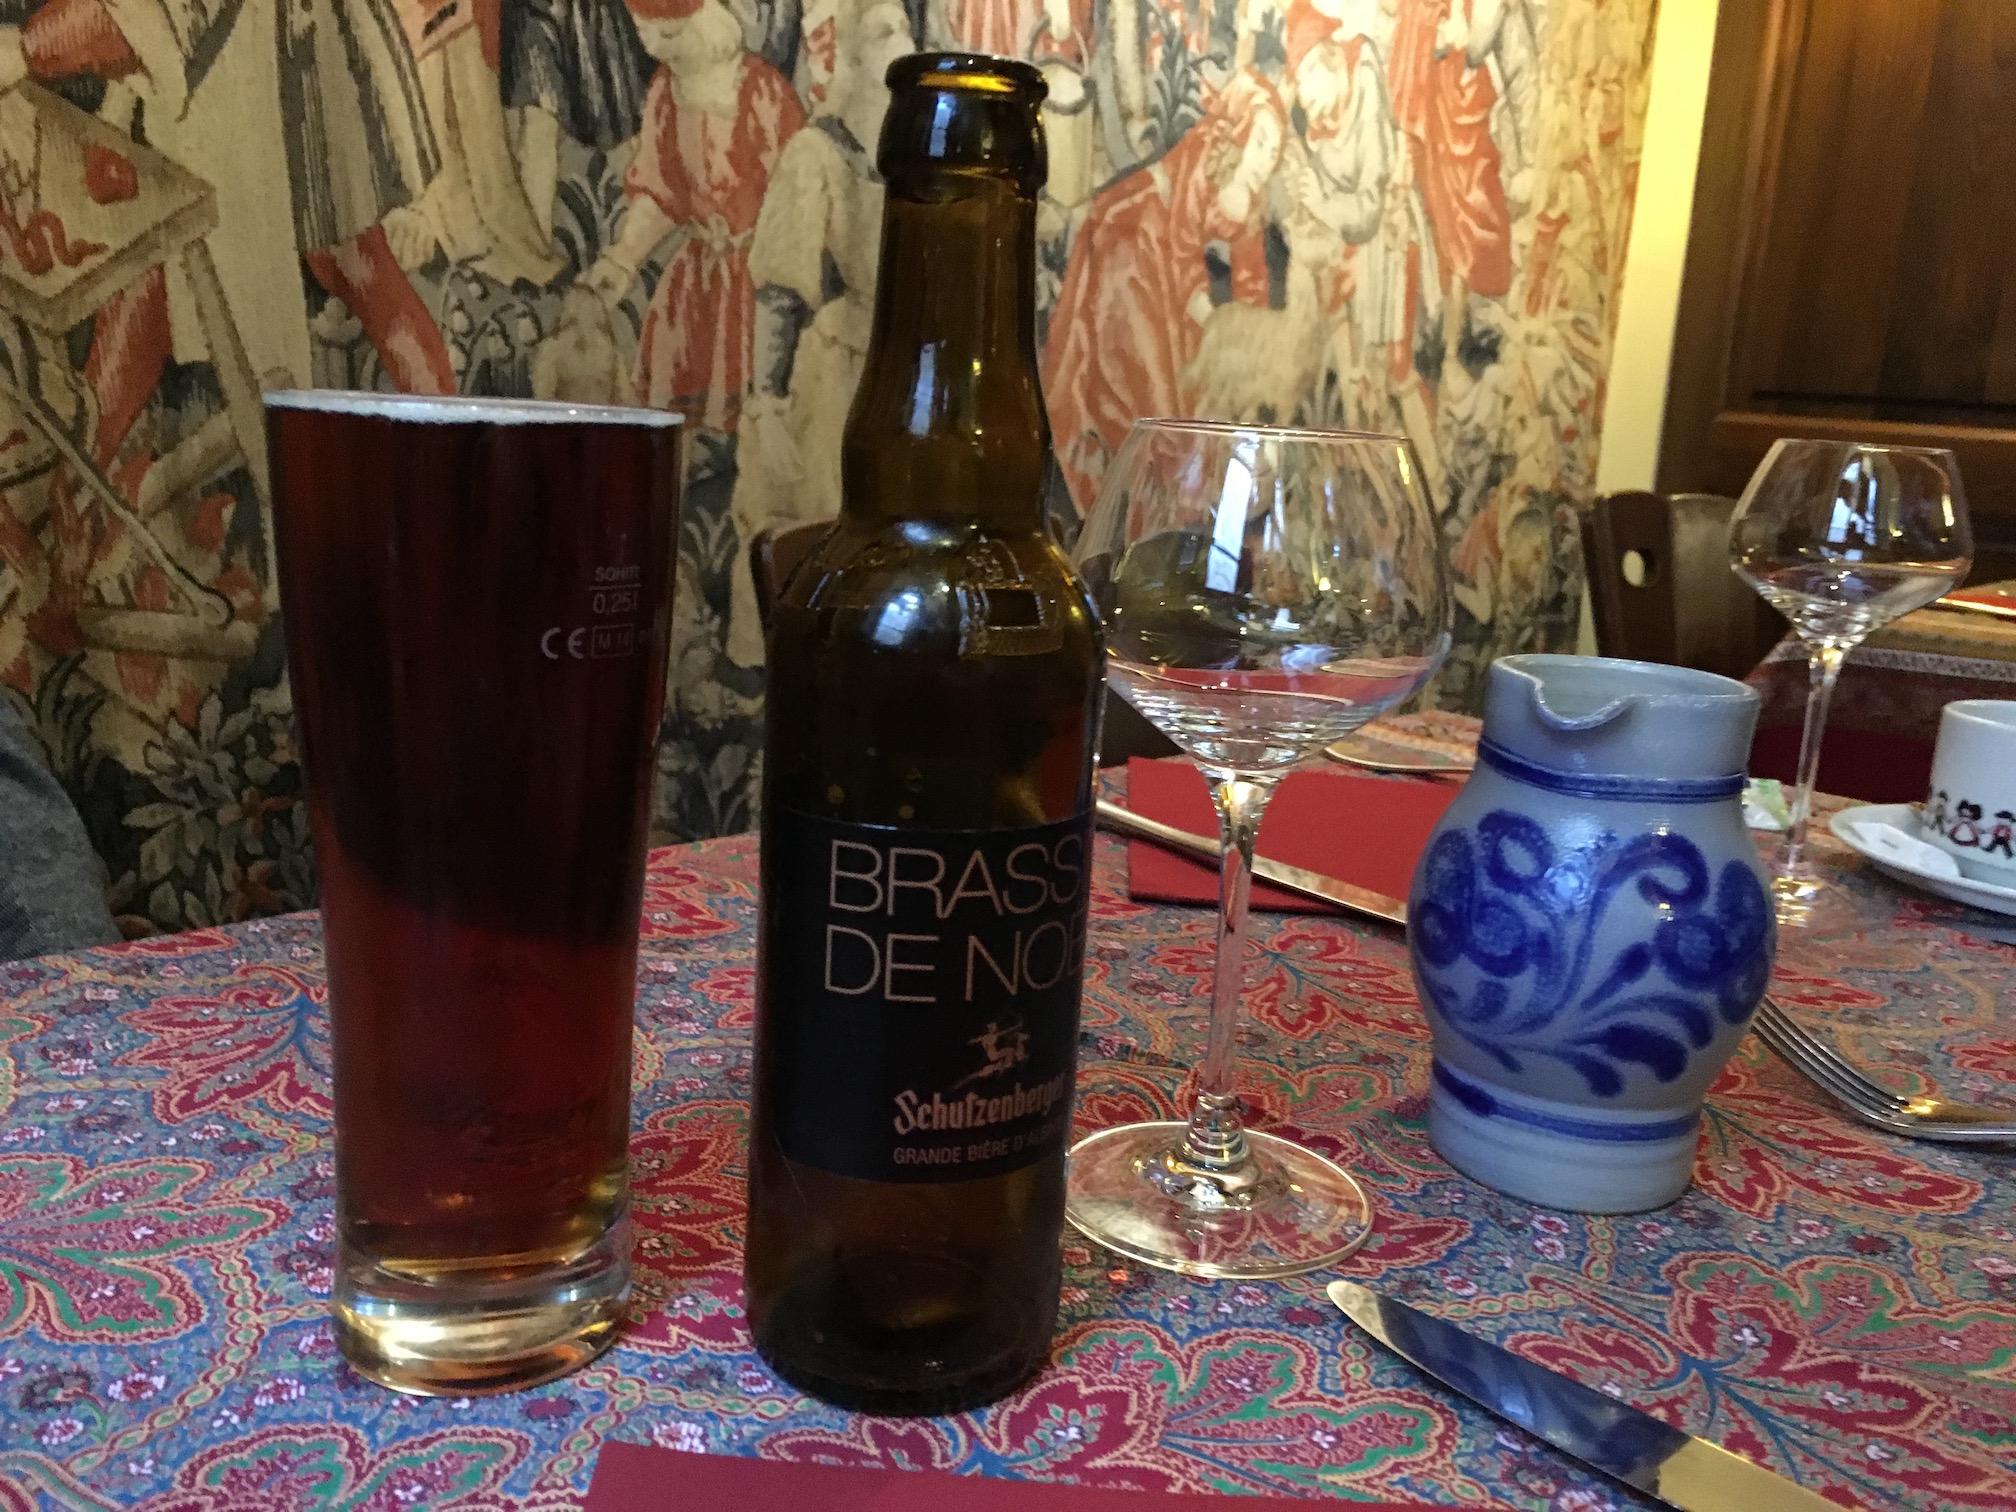 Matt's Christmas beer and my  pichet of white wine at  Chez Yvonne